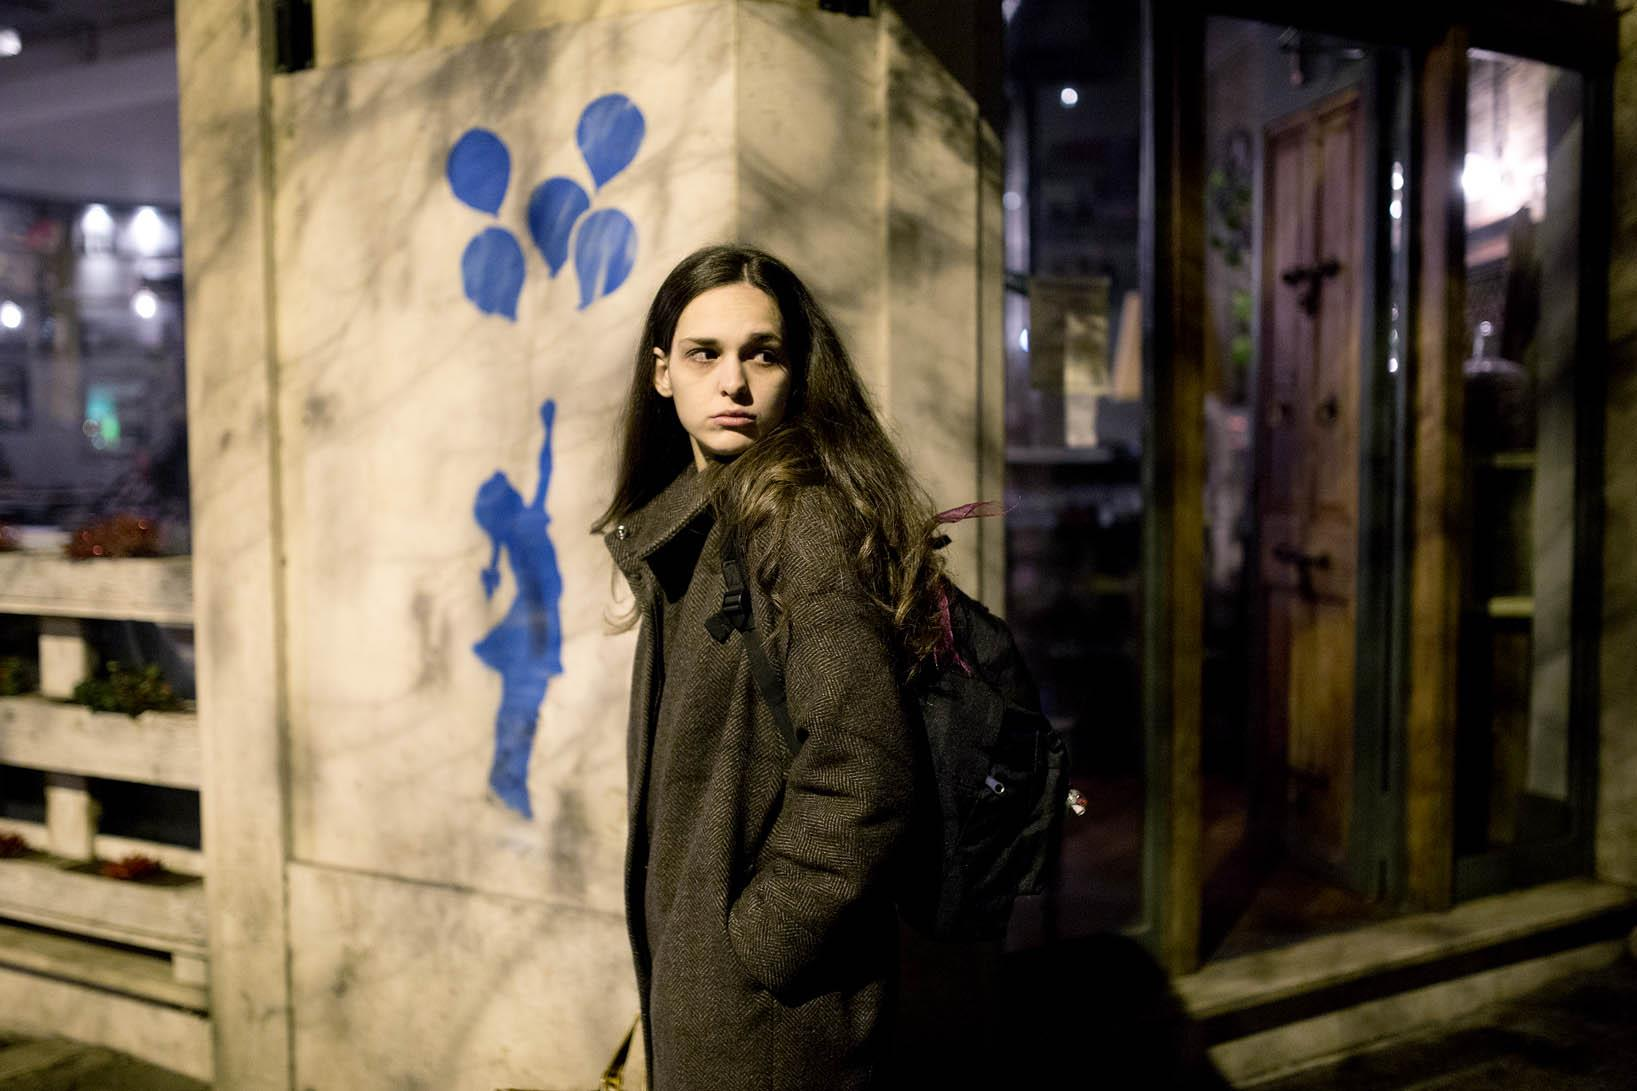 Sara Serraiocco, Worldly Girl